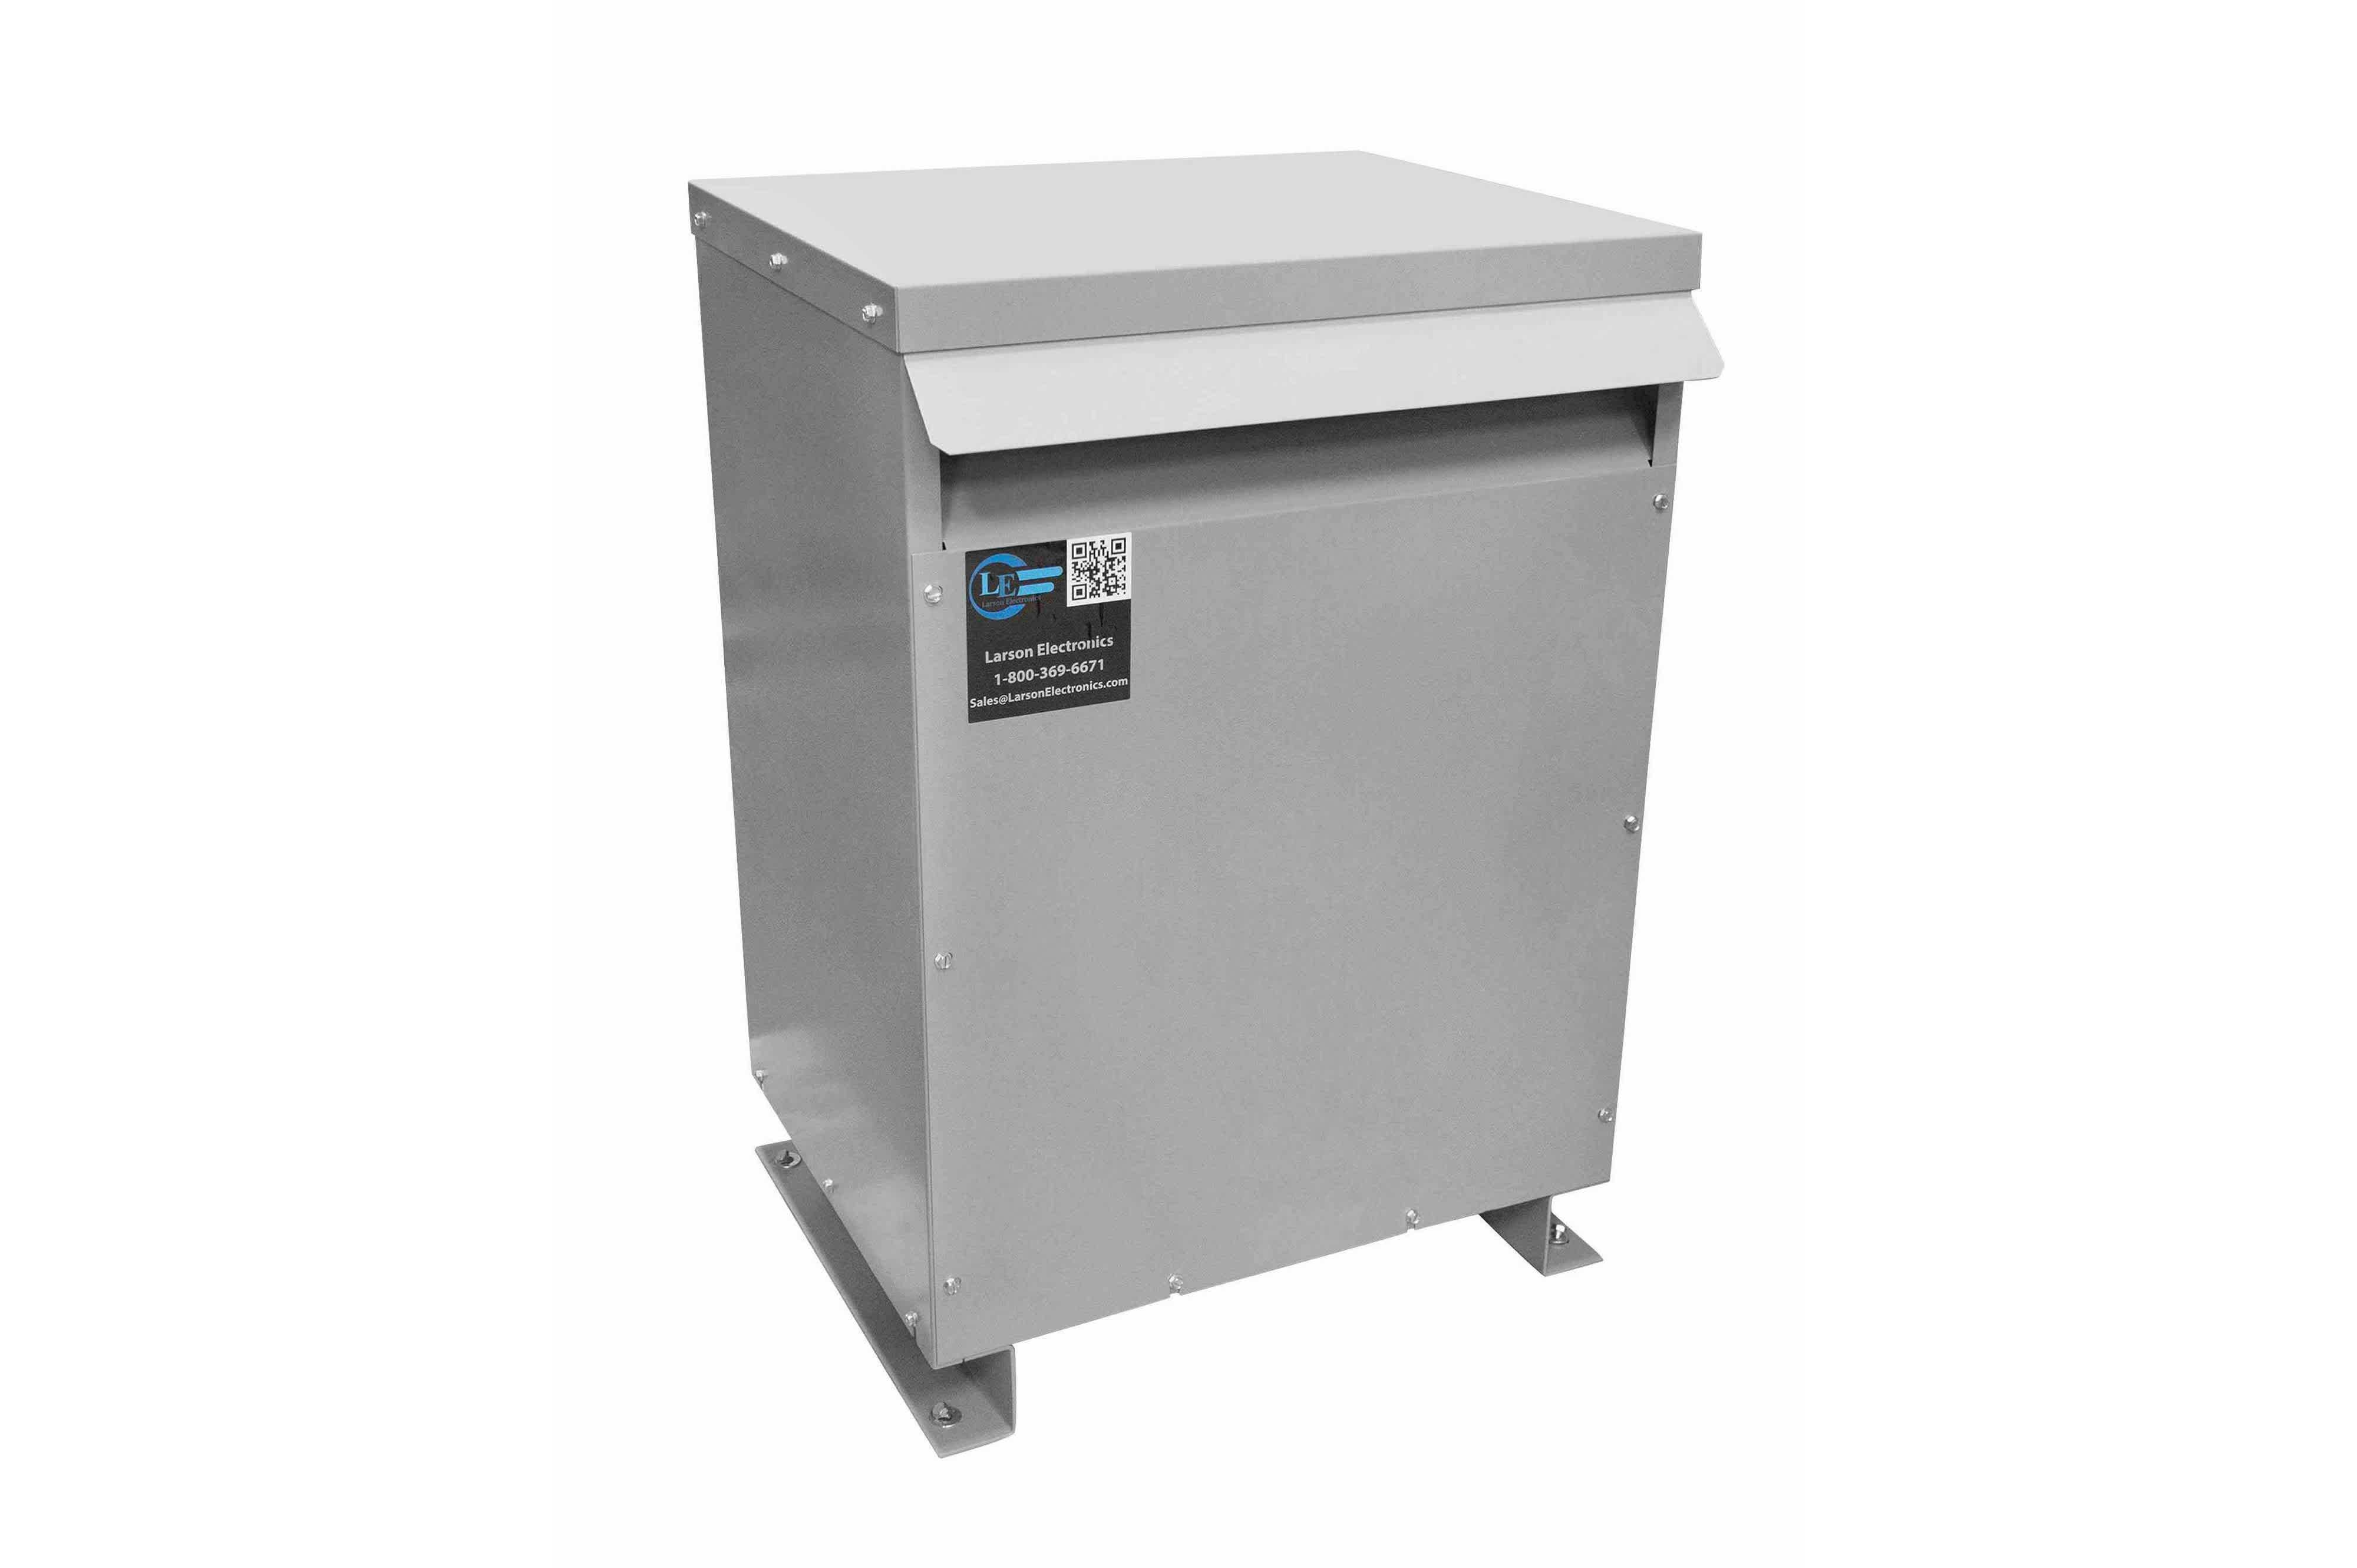 20 kVA 3PH DOE Transformer, 440V Delta Primary, 208Y/120 Wye-N Secondary, N3R, Ventilated, 60 Hz